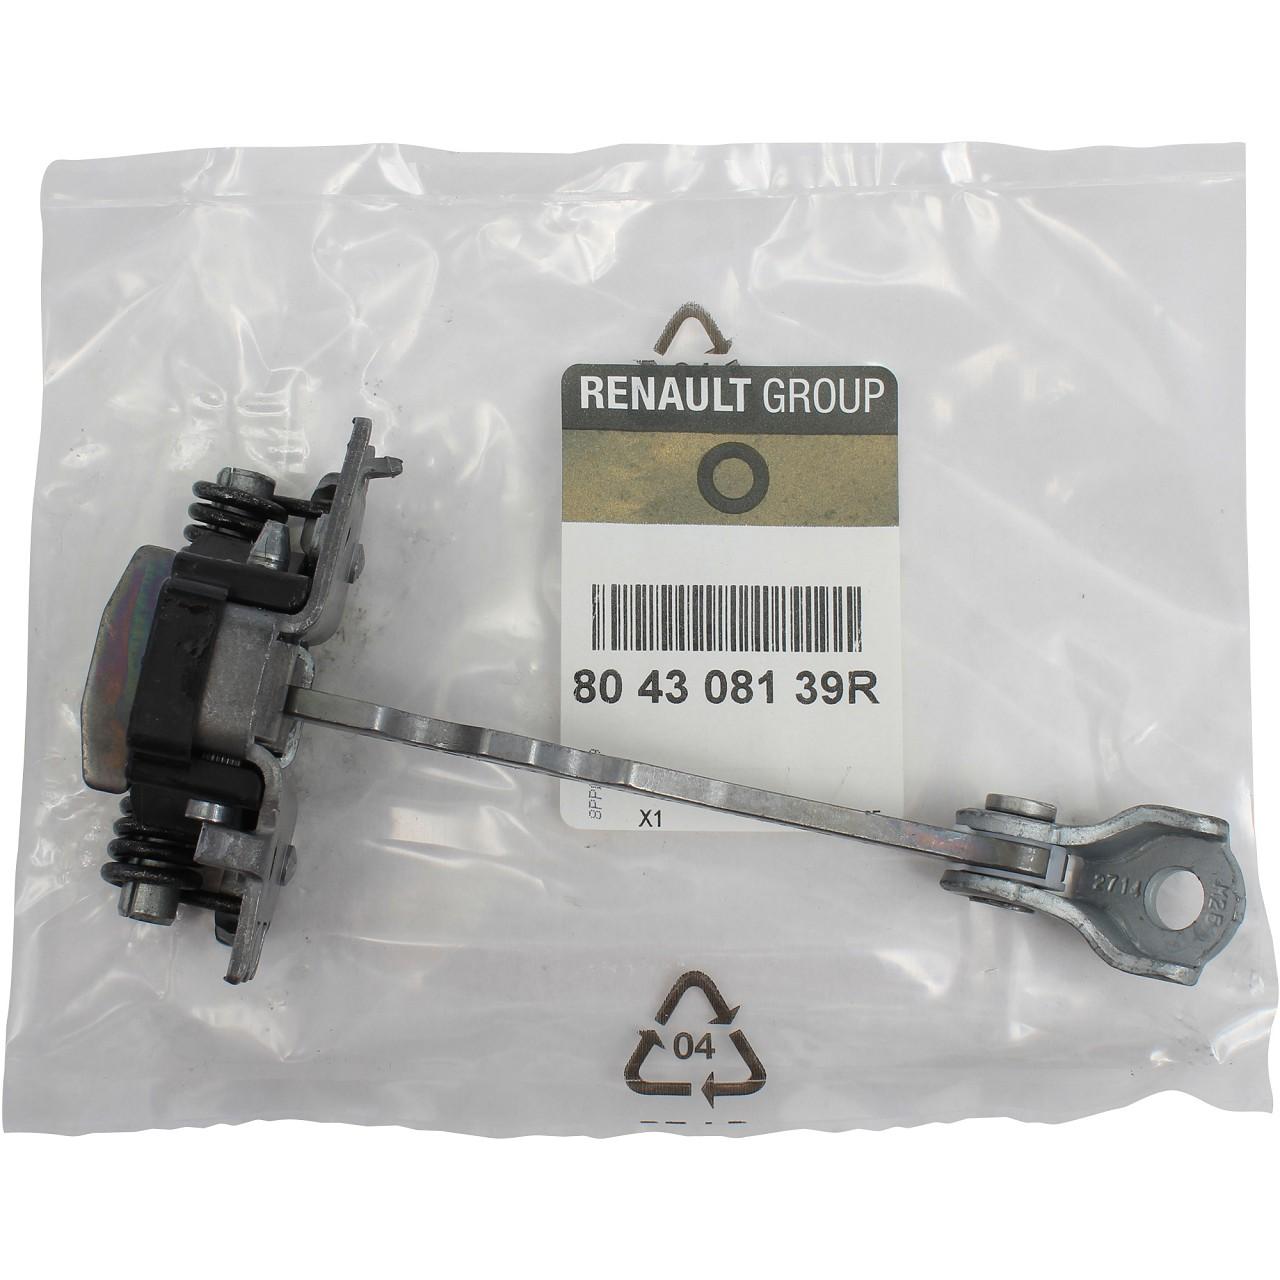 ORIGINAL Renault Türfeststeller Türsteller Türhalteband Türfangband 804308139R